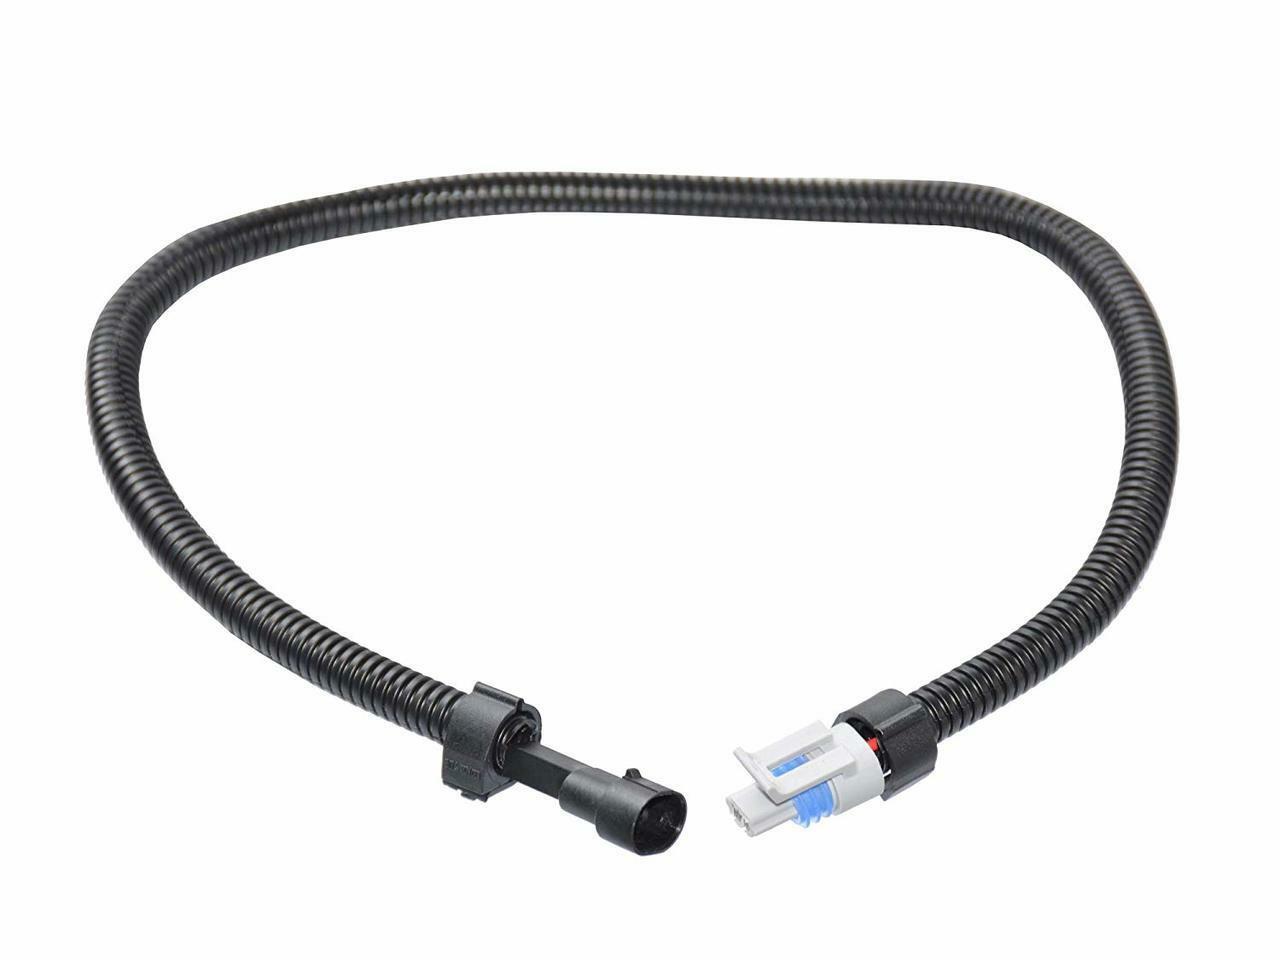 medium resolution of intake air temp iat mat sensor wire harness extension 36 fits gm ls1 lt1